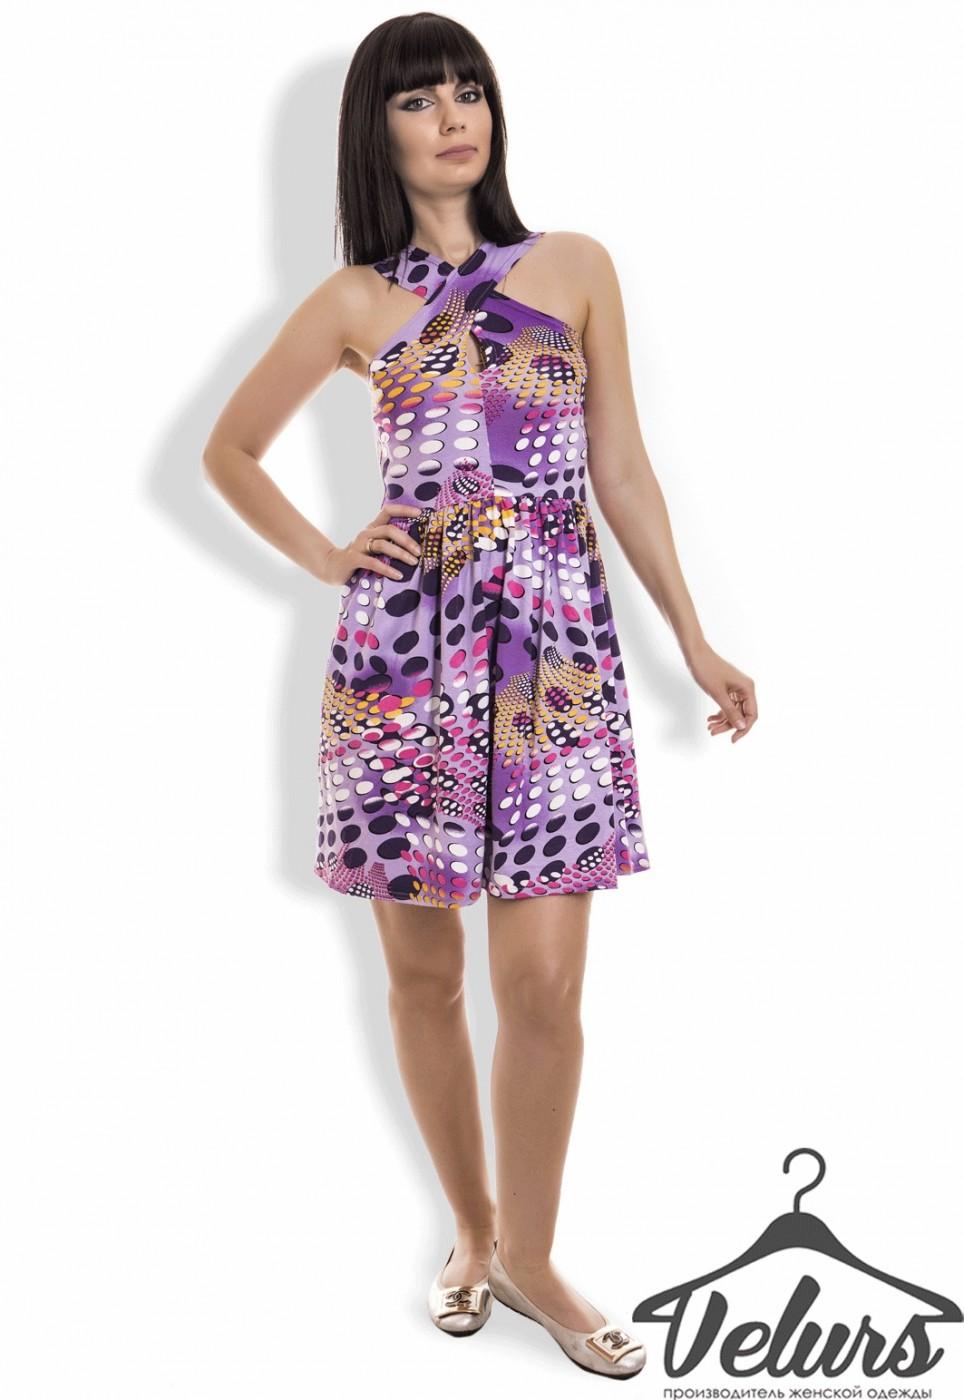 Velurs: Платье 21962 - фото 10